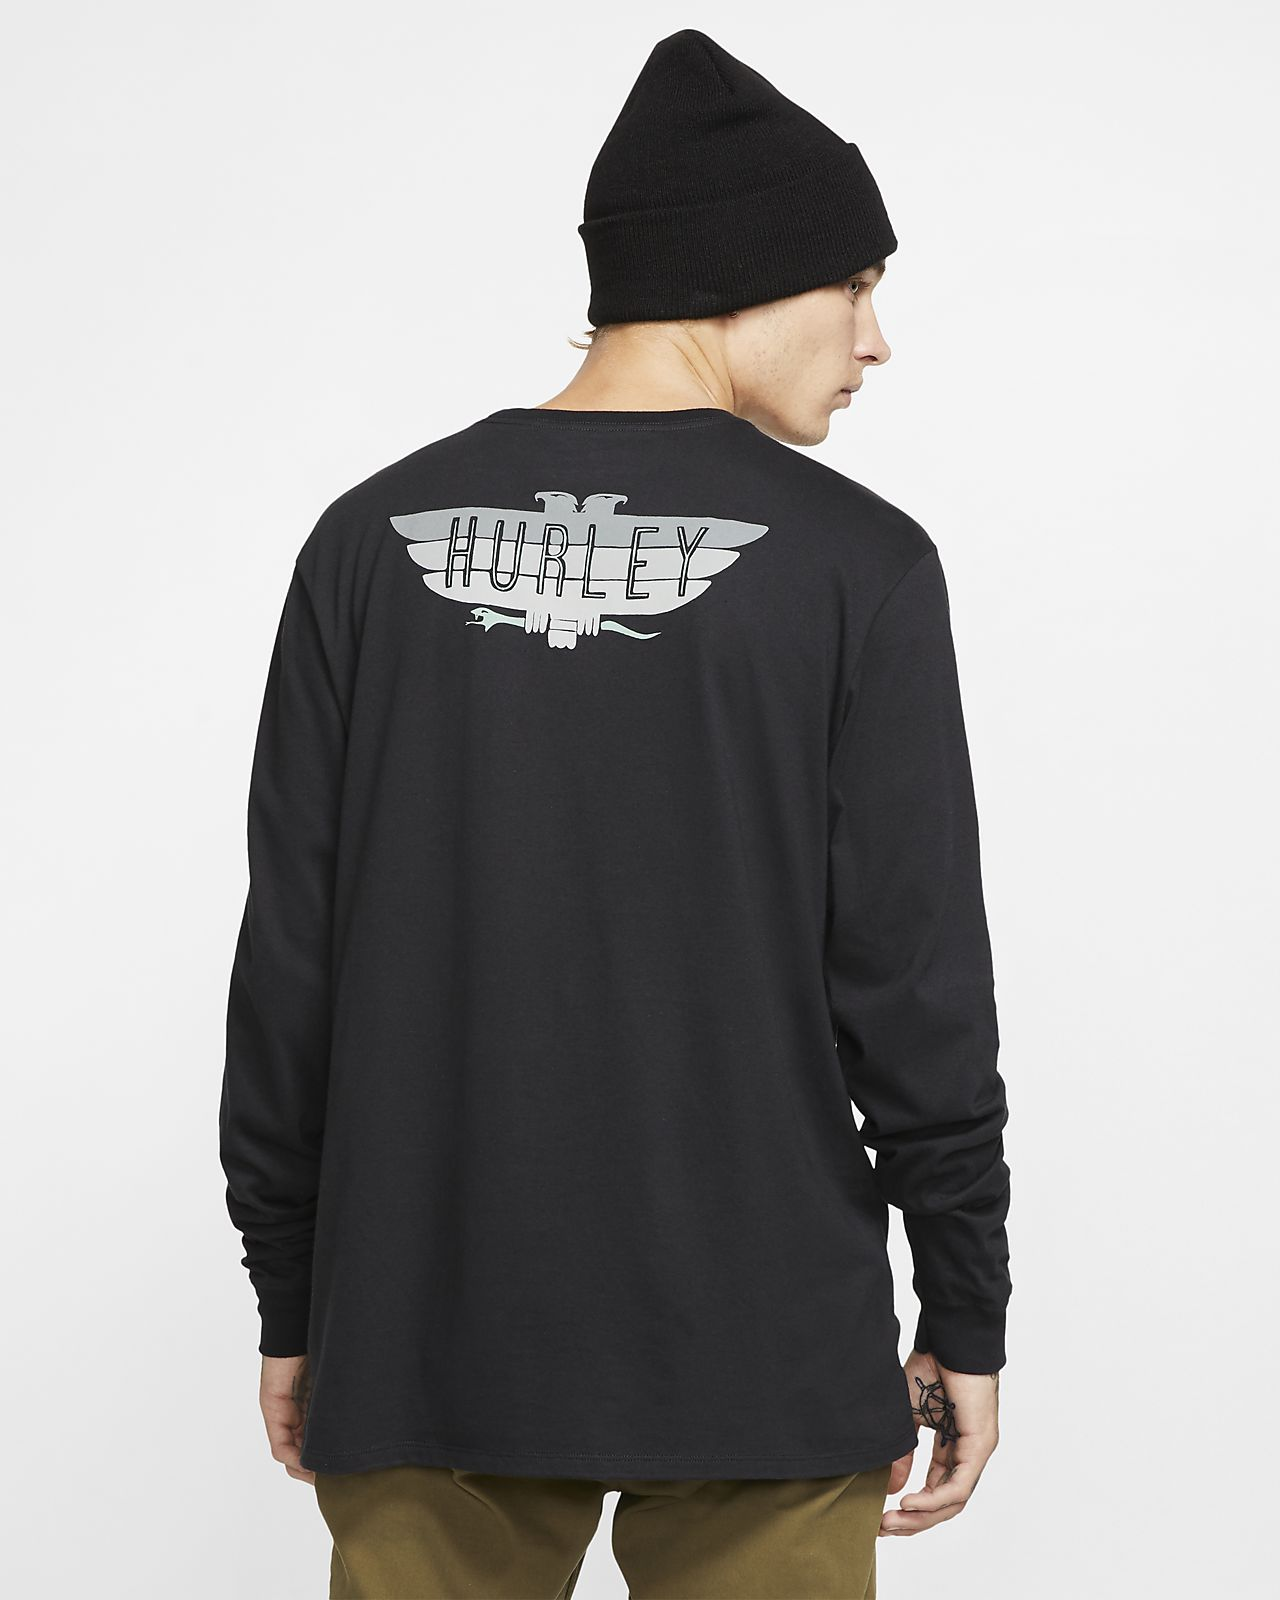 Pánské tričko Hurley Premium Birdbars s dlouhým rukávem